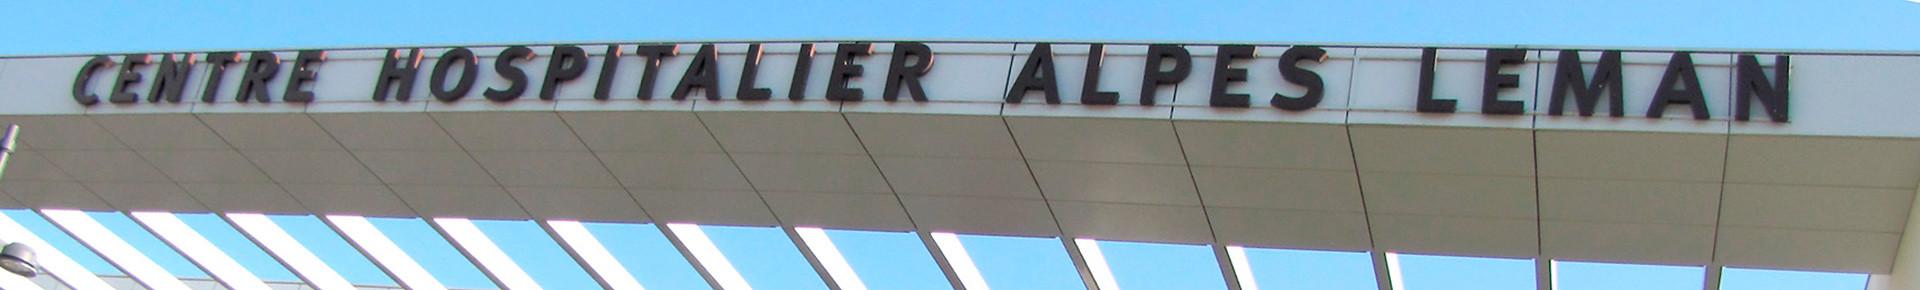 Centre hospitalier Alpes Leman